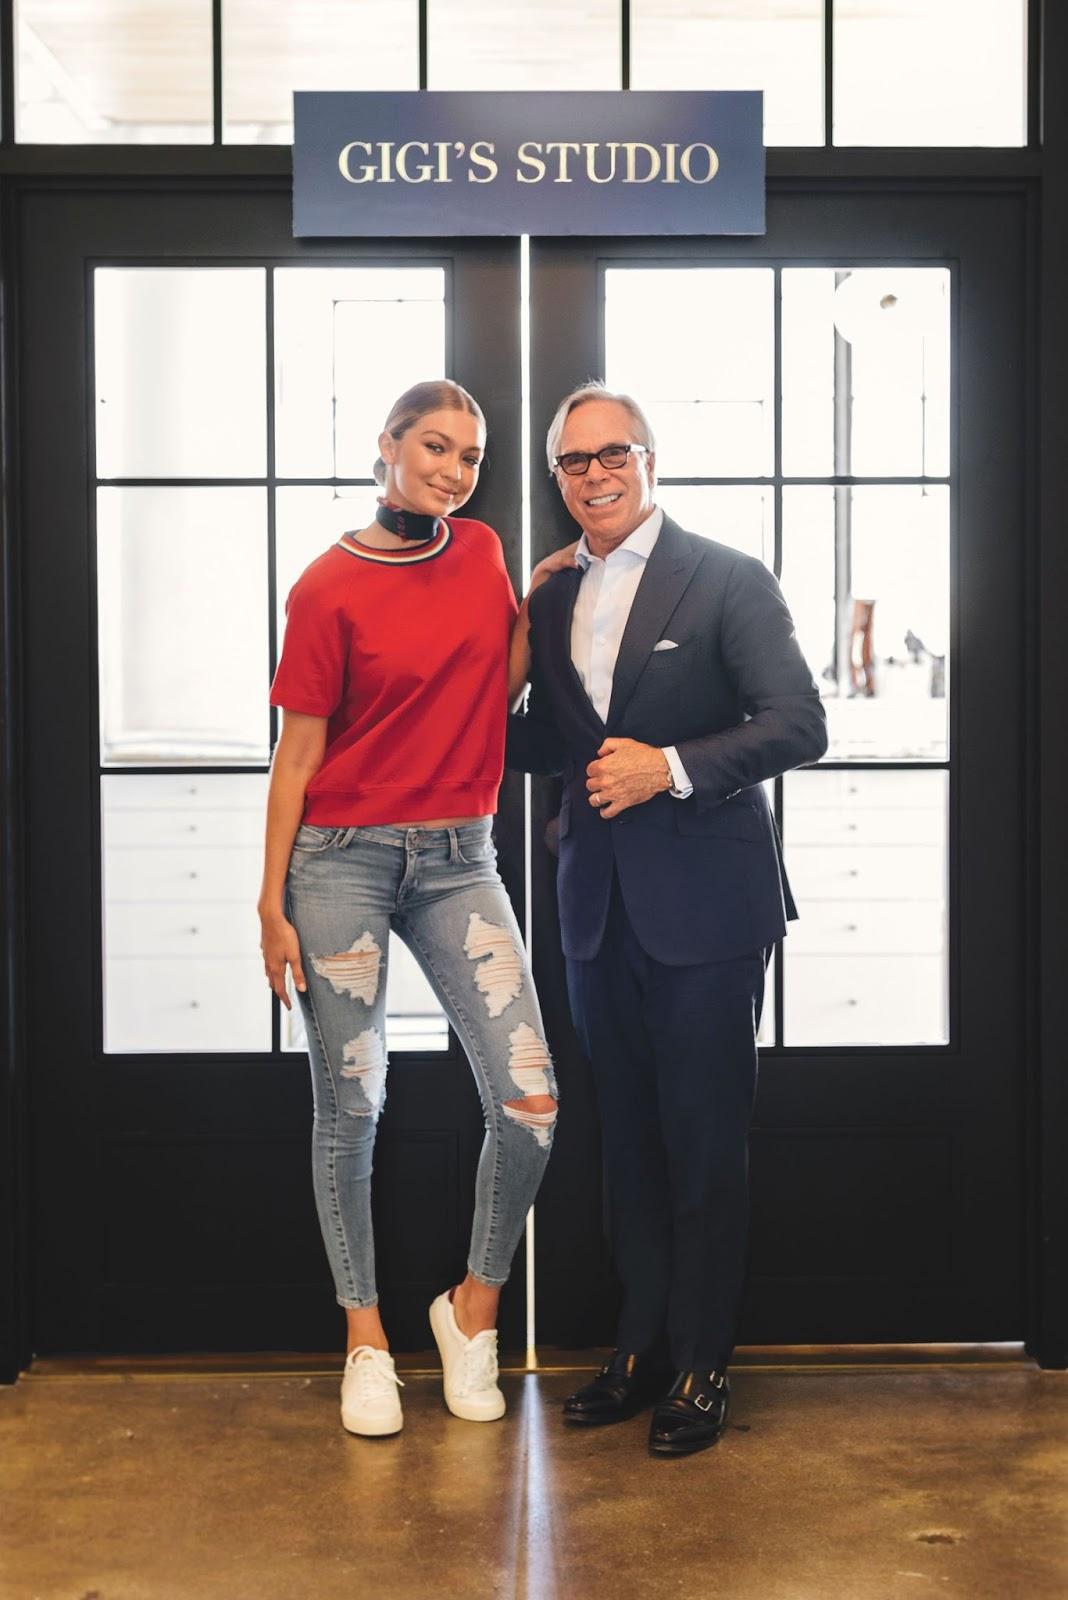 Eniwhere Fashion - News on Fashion - Gigi Hadid